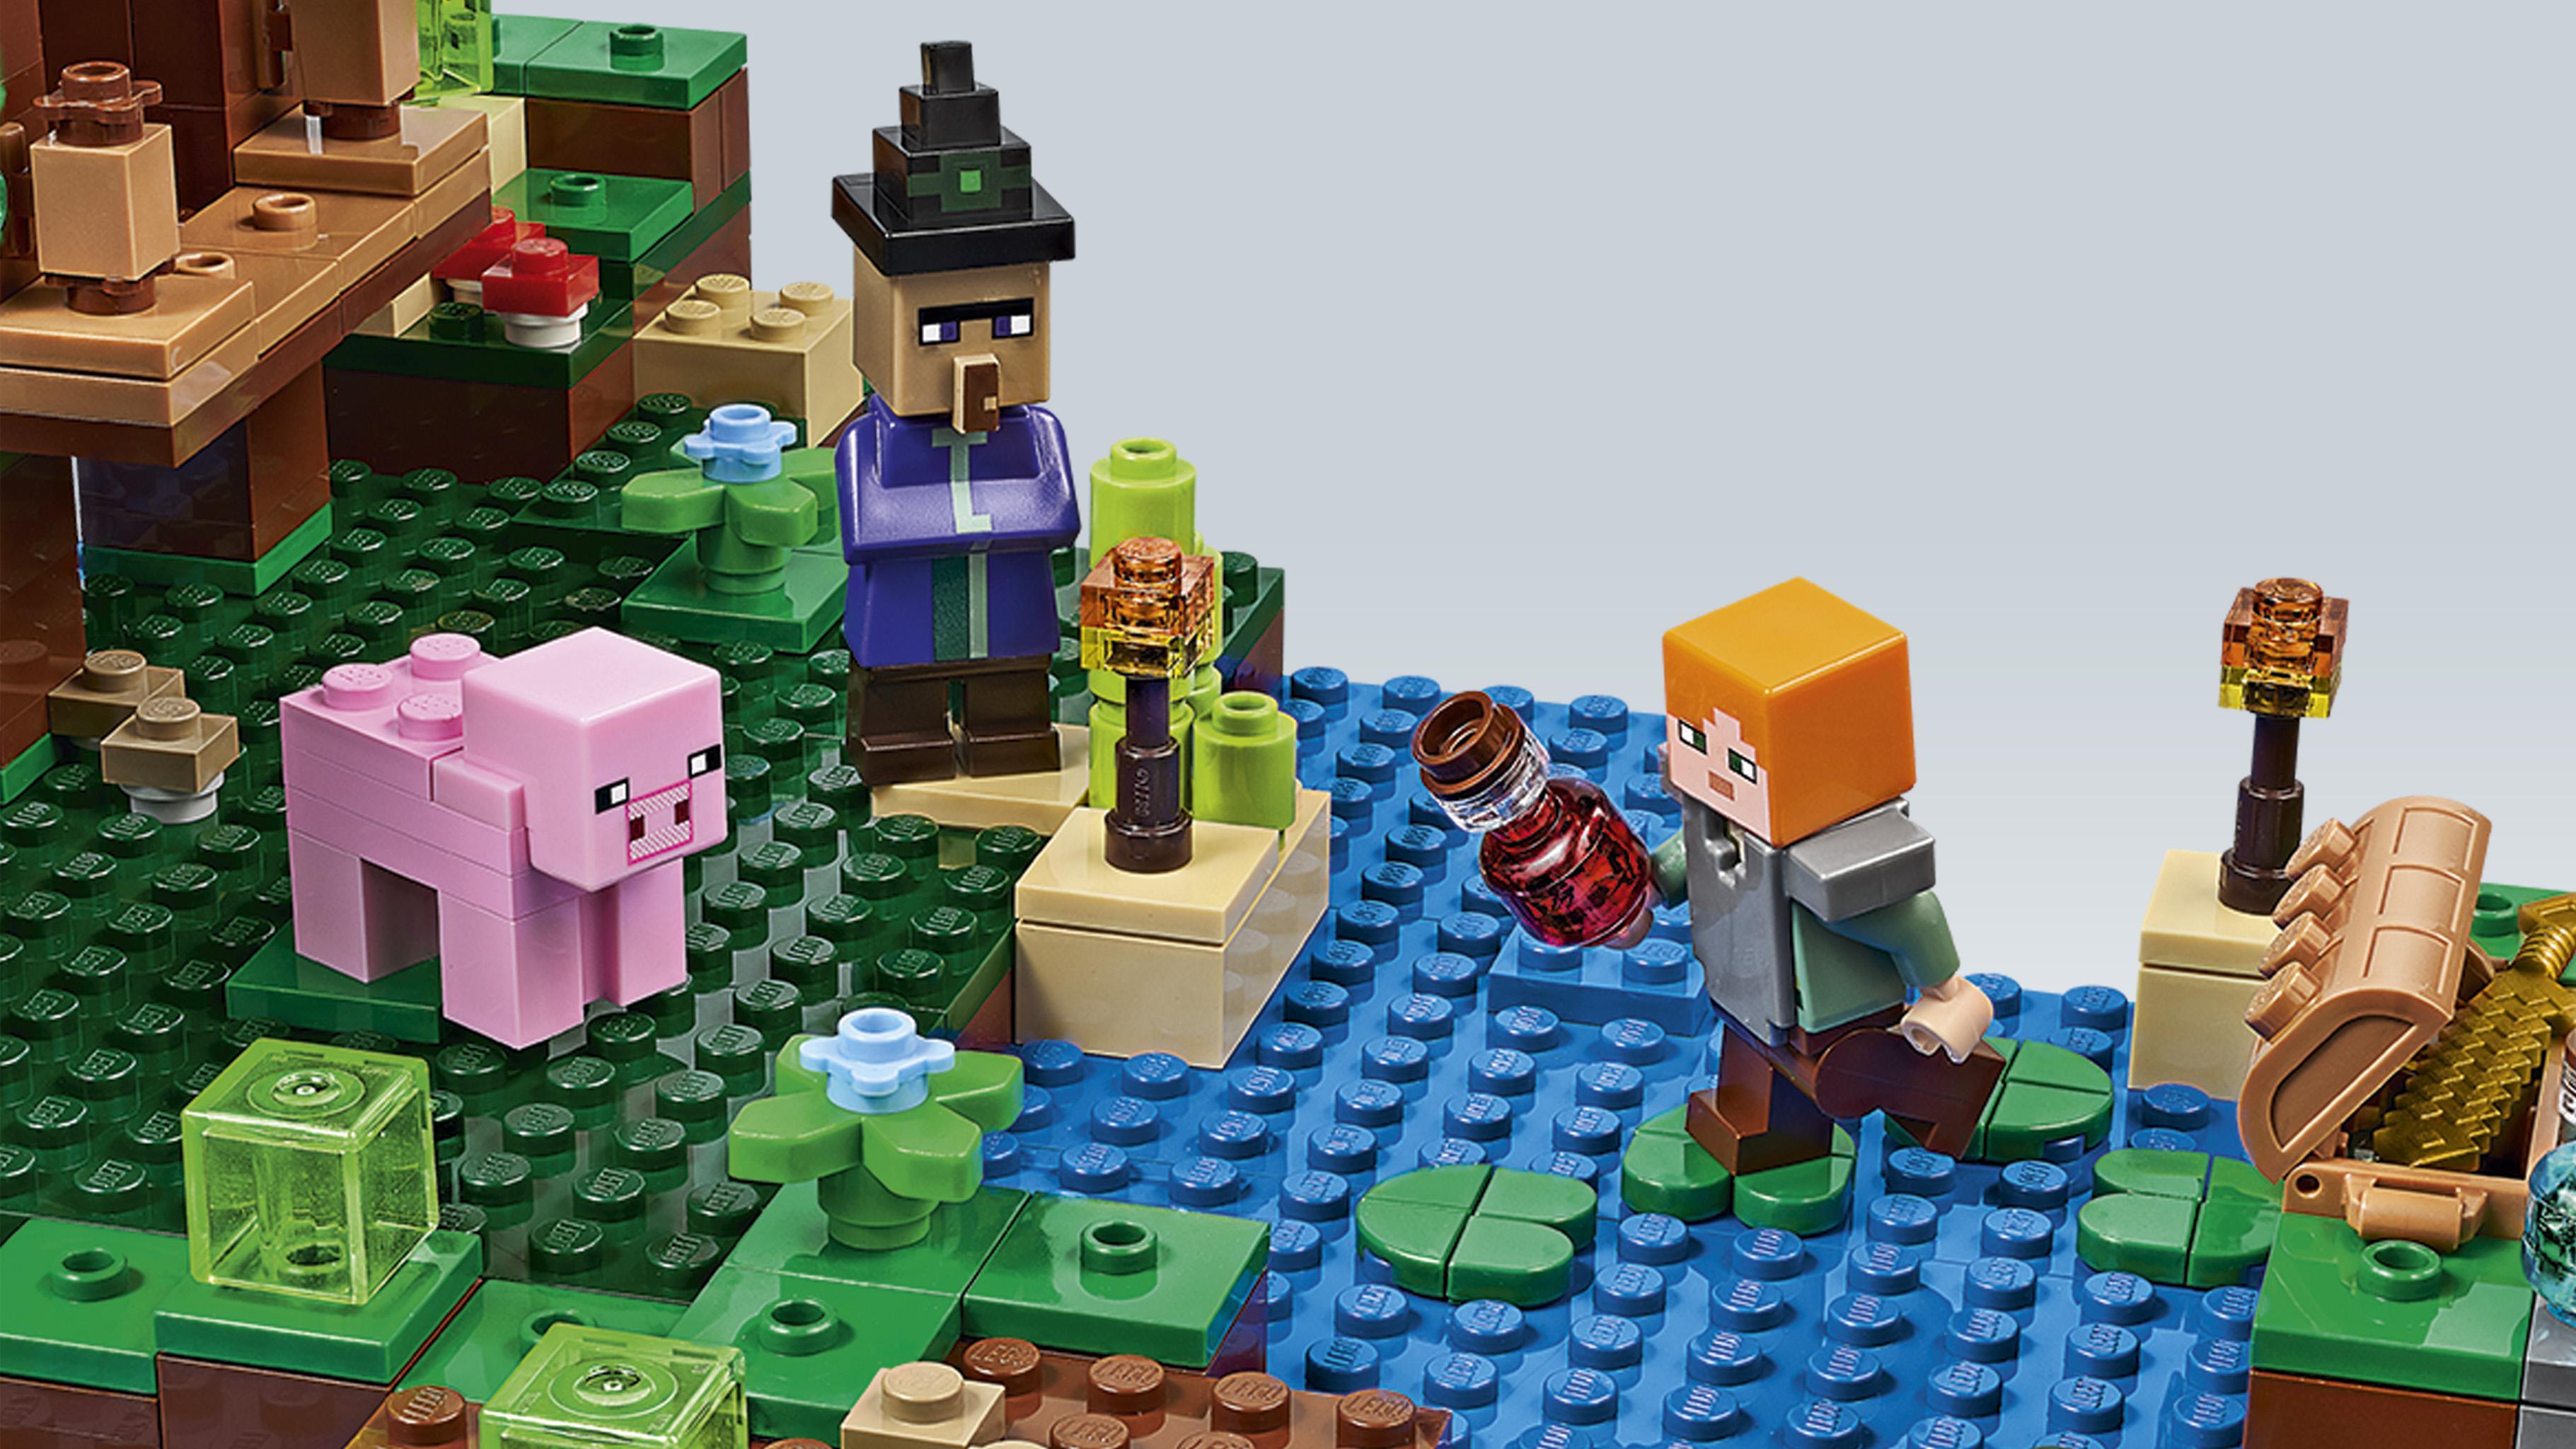 Amazoncom Lego Minecraft The Waterfall Base 21134 Toys 4567991 Ivy Leaf Silhouette Limey Poster Suit Icon Dorothea Lange Photos Of Kids Cool Illuminati